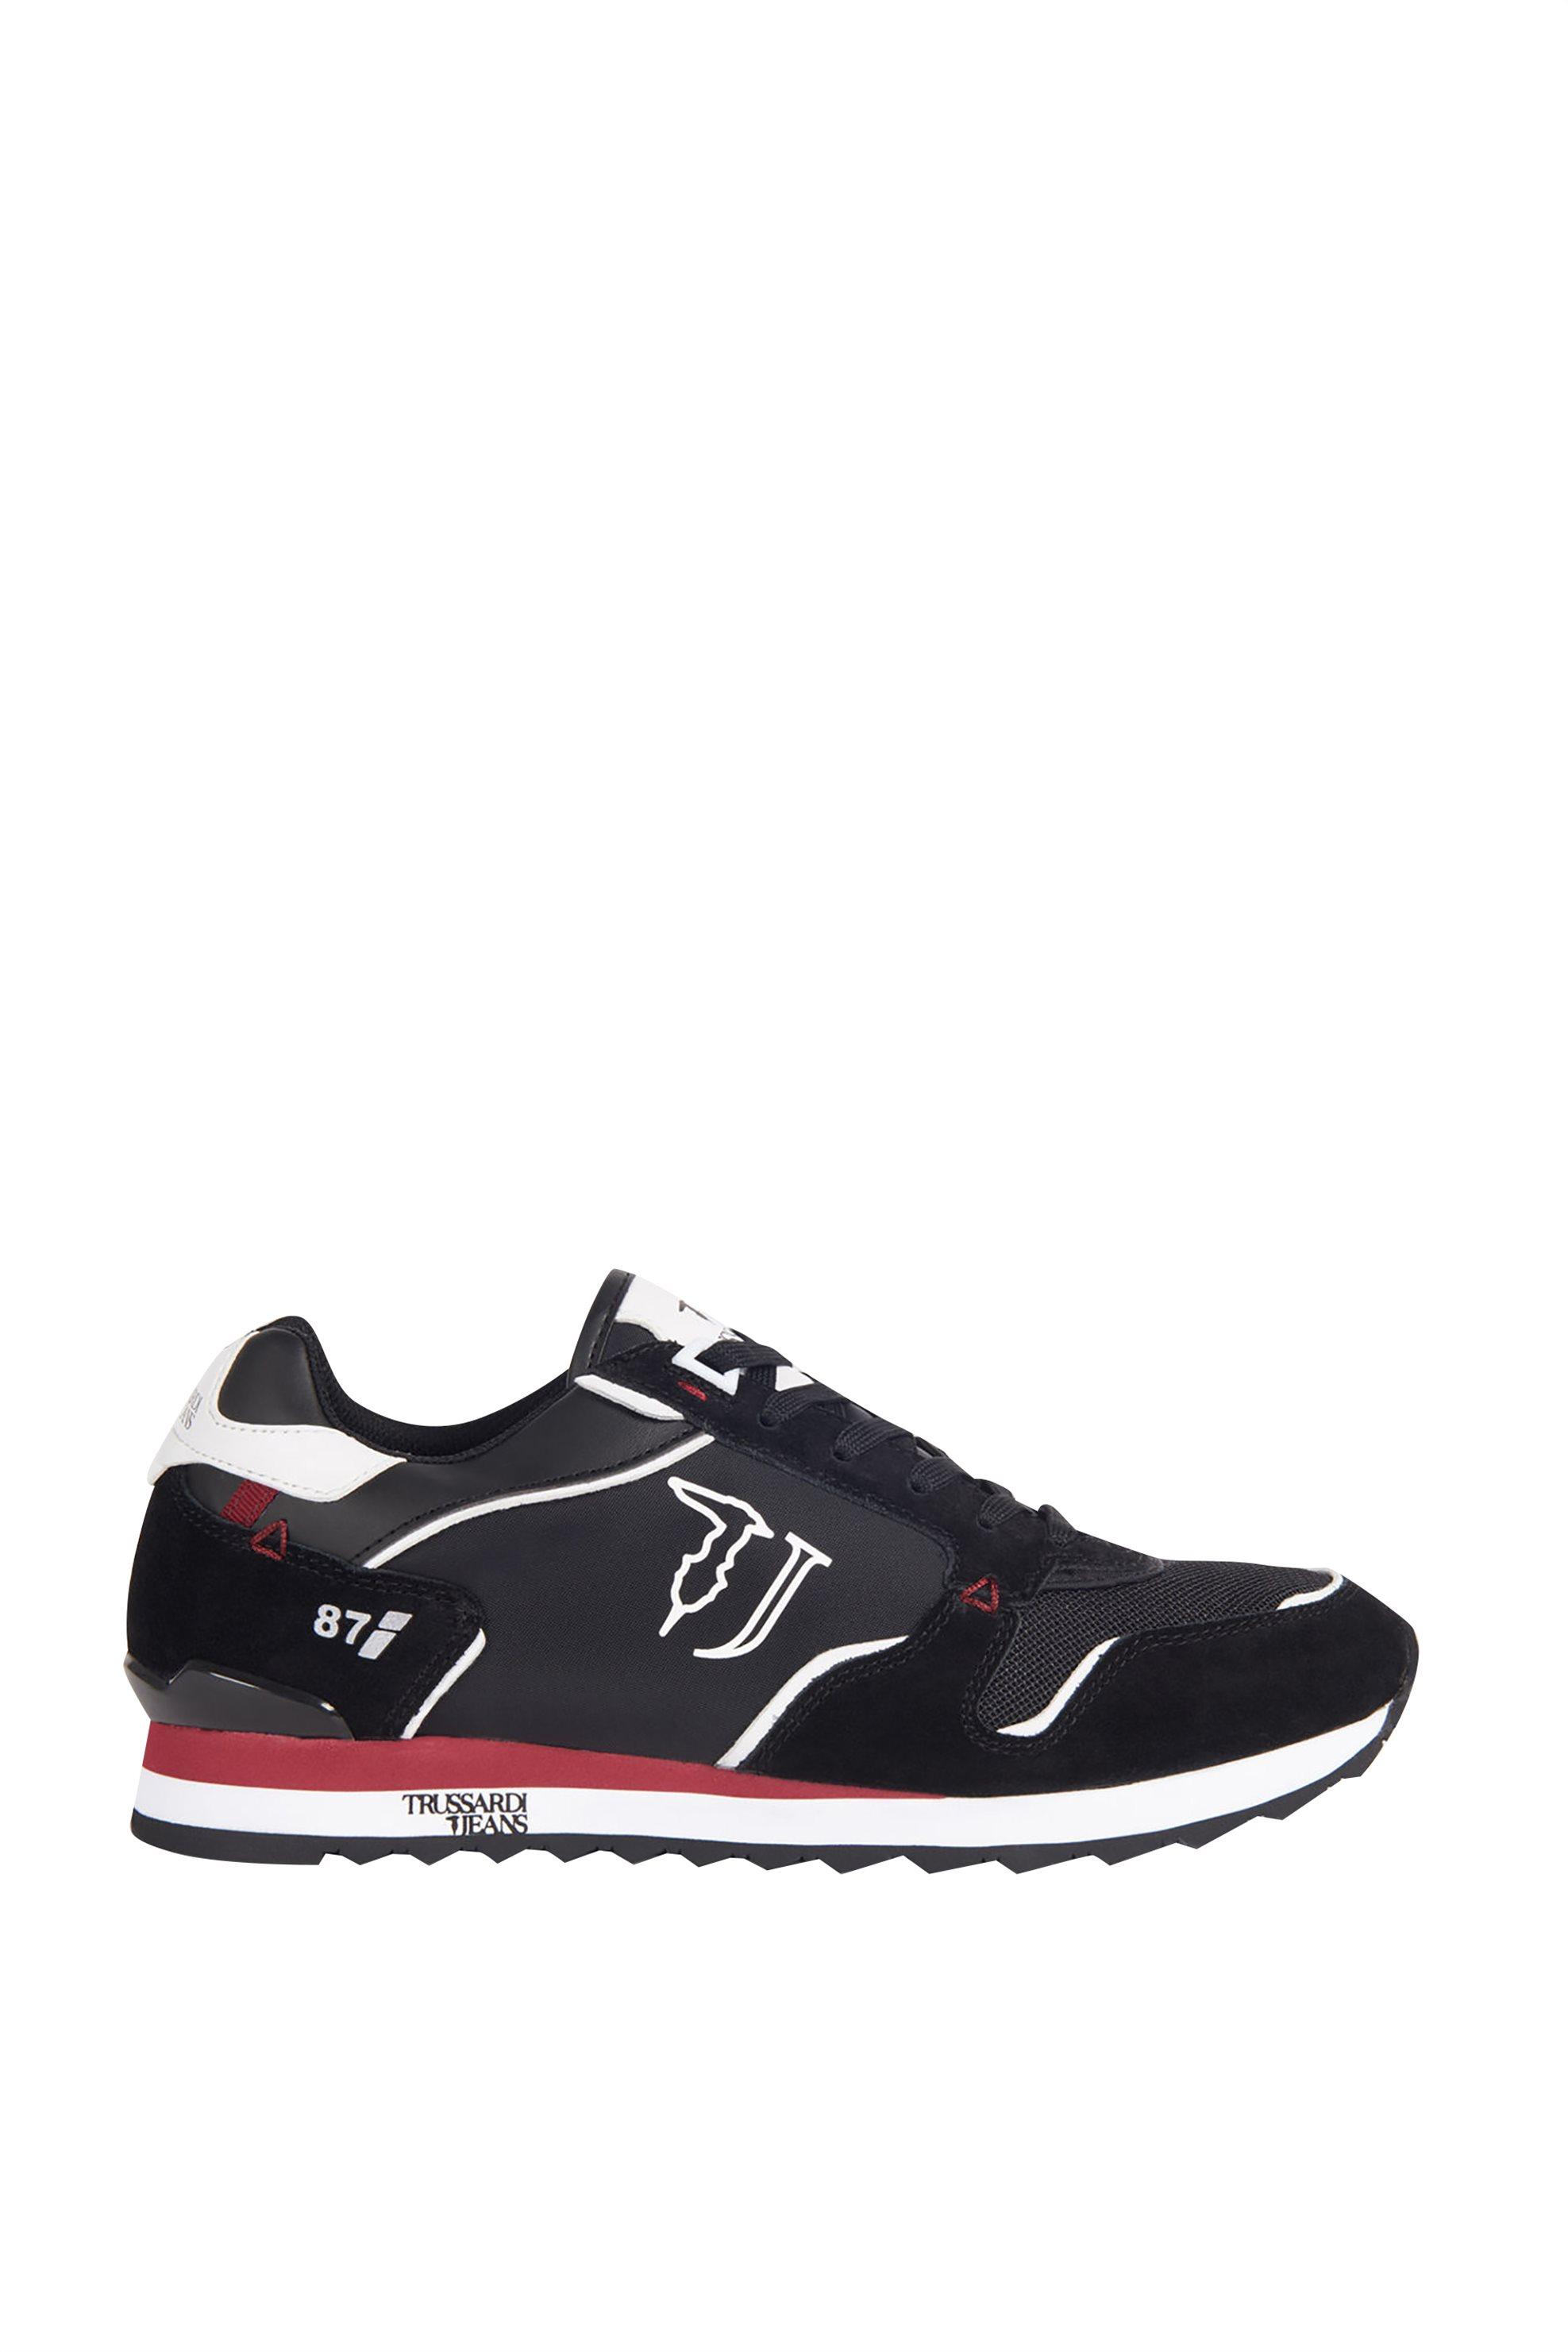 Trussardi Jeans ανδρικά sneakers με suede λεπτομέρειες και logo print – 77A00188-9Y099999 – Μαύρο